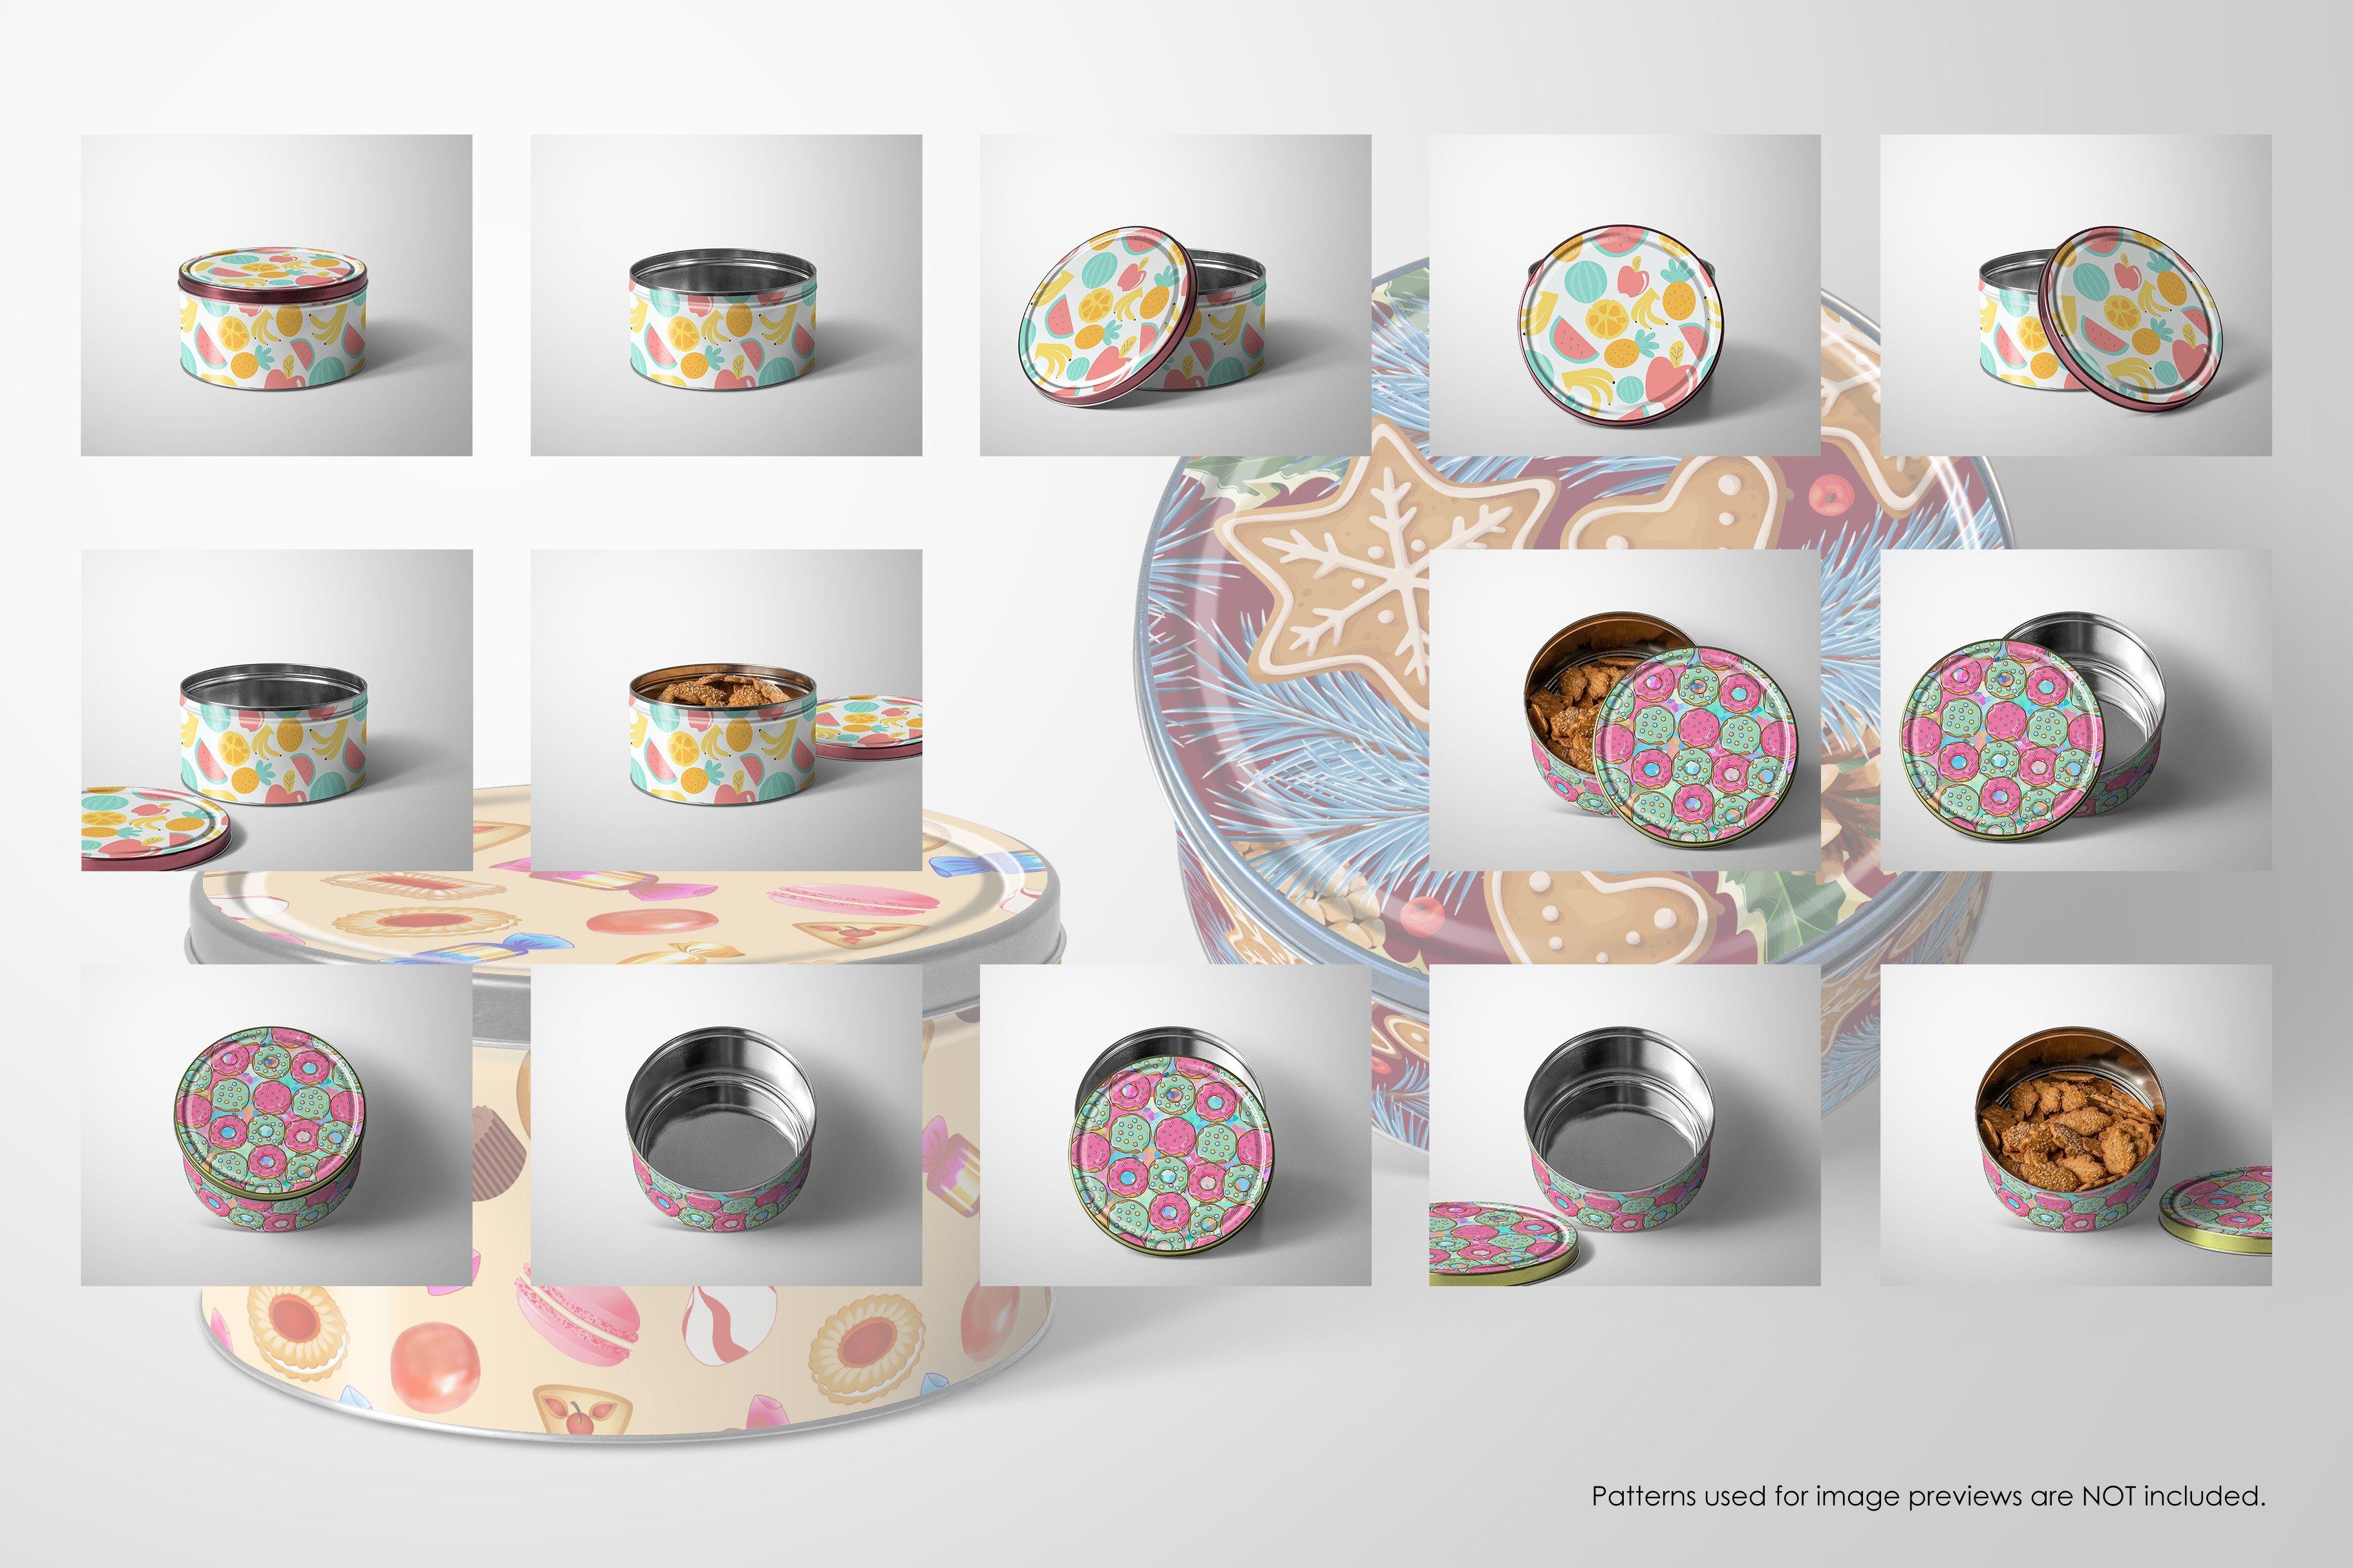 6K高清产品金属贴合外观设计展示样机 Metal Box Mockup 6K插图1